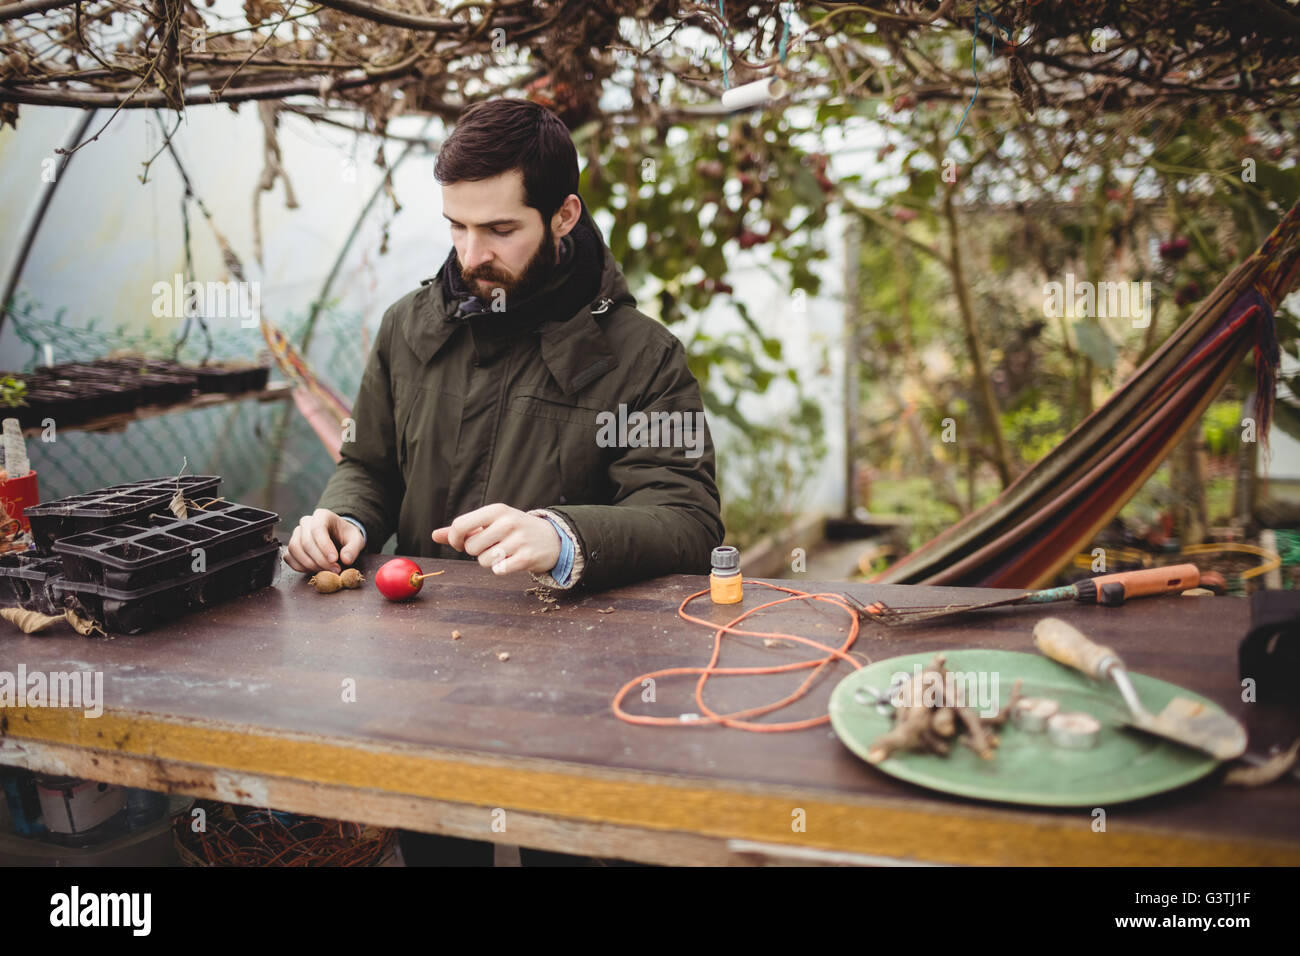 Hipster man sitting and gardening - Stock Image